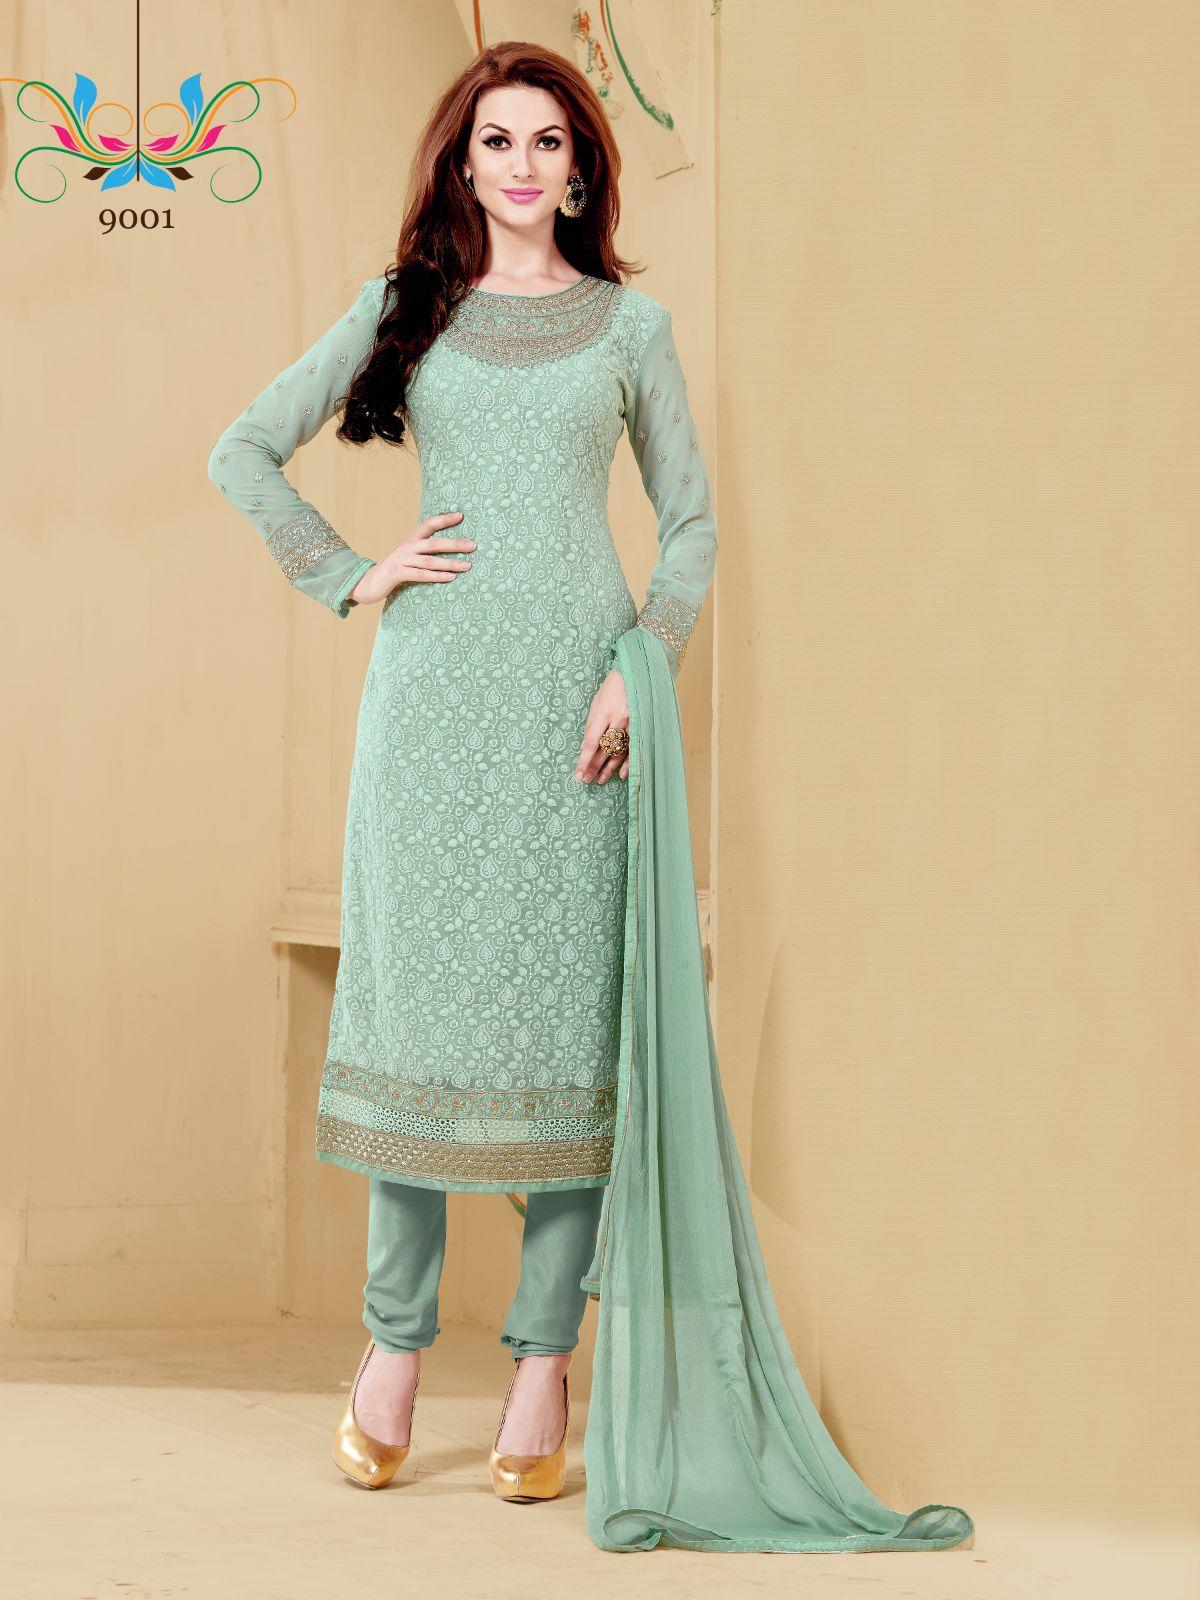 P 9 – Beautiful Looking Designer Embroidered Salwar Suit